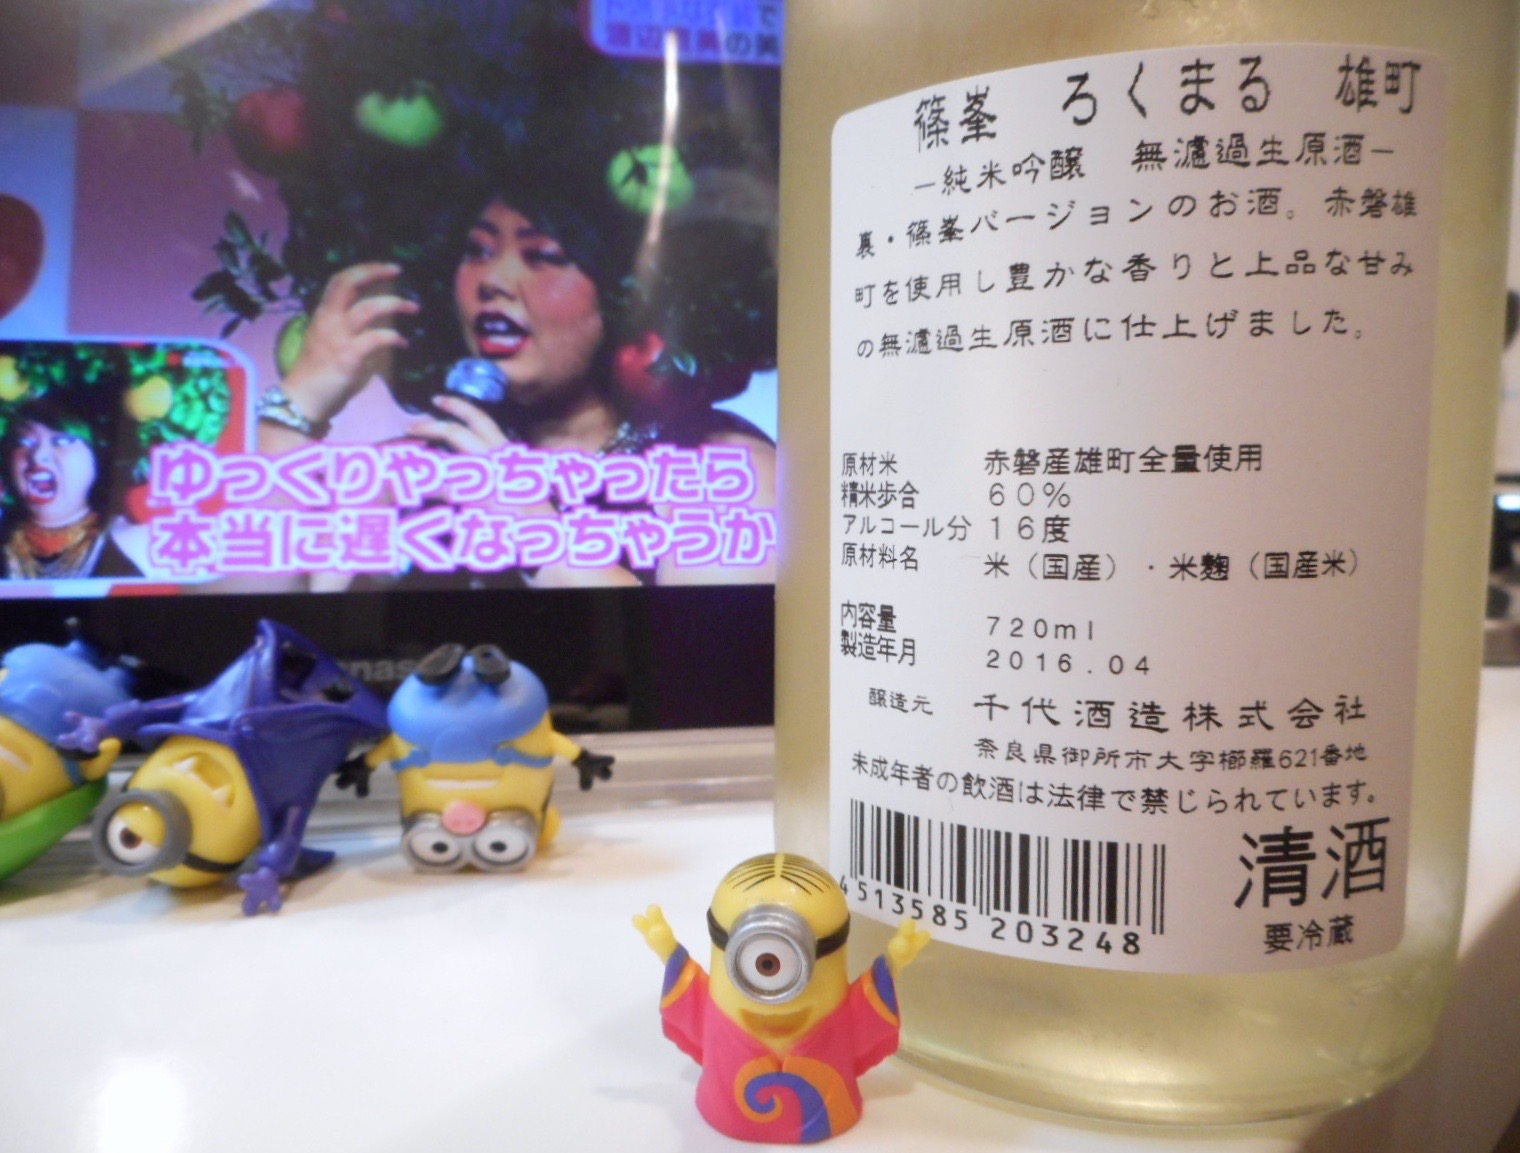 rokumaru_omachi27by3.jpg